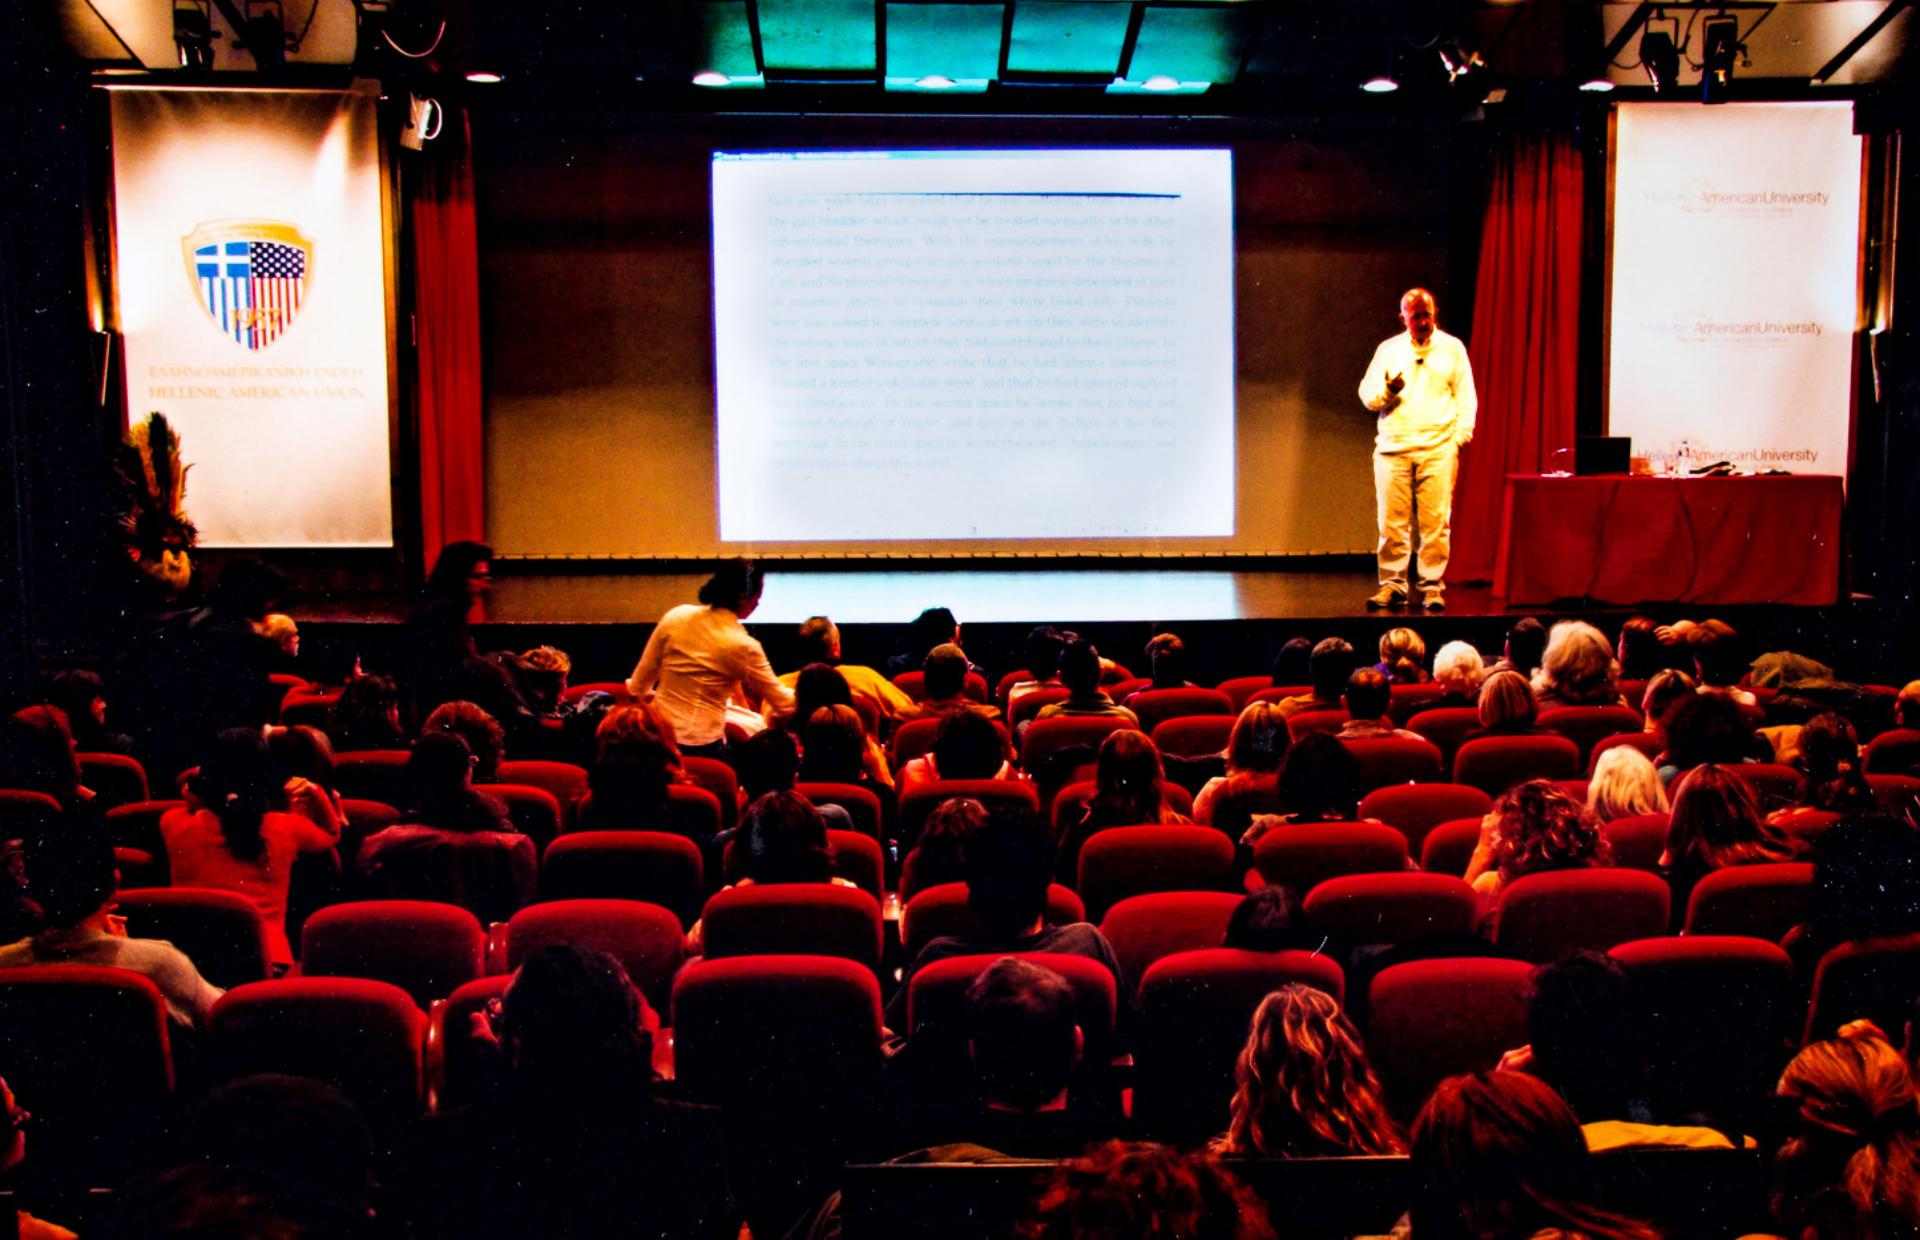 "Online φωτογραφικές ""Συναντήσεις της Πέμπτης"" τον Δεκέμβριο από την Ελληνοαμερικανική Ένωση"